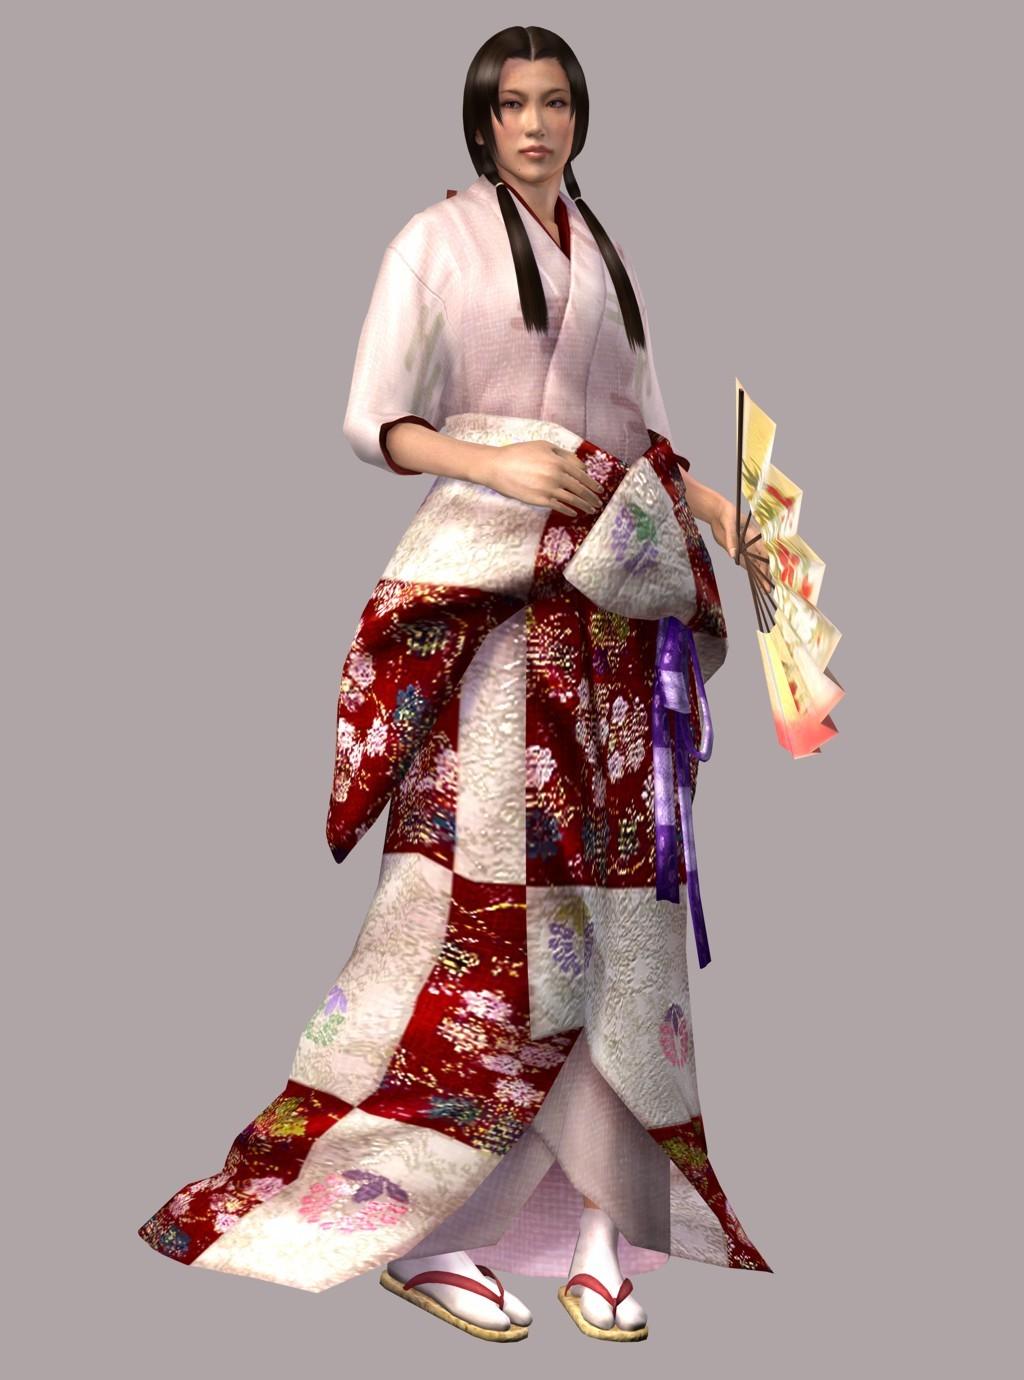 Way of the Samurai 3 - I primi artwork